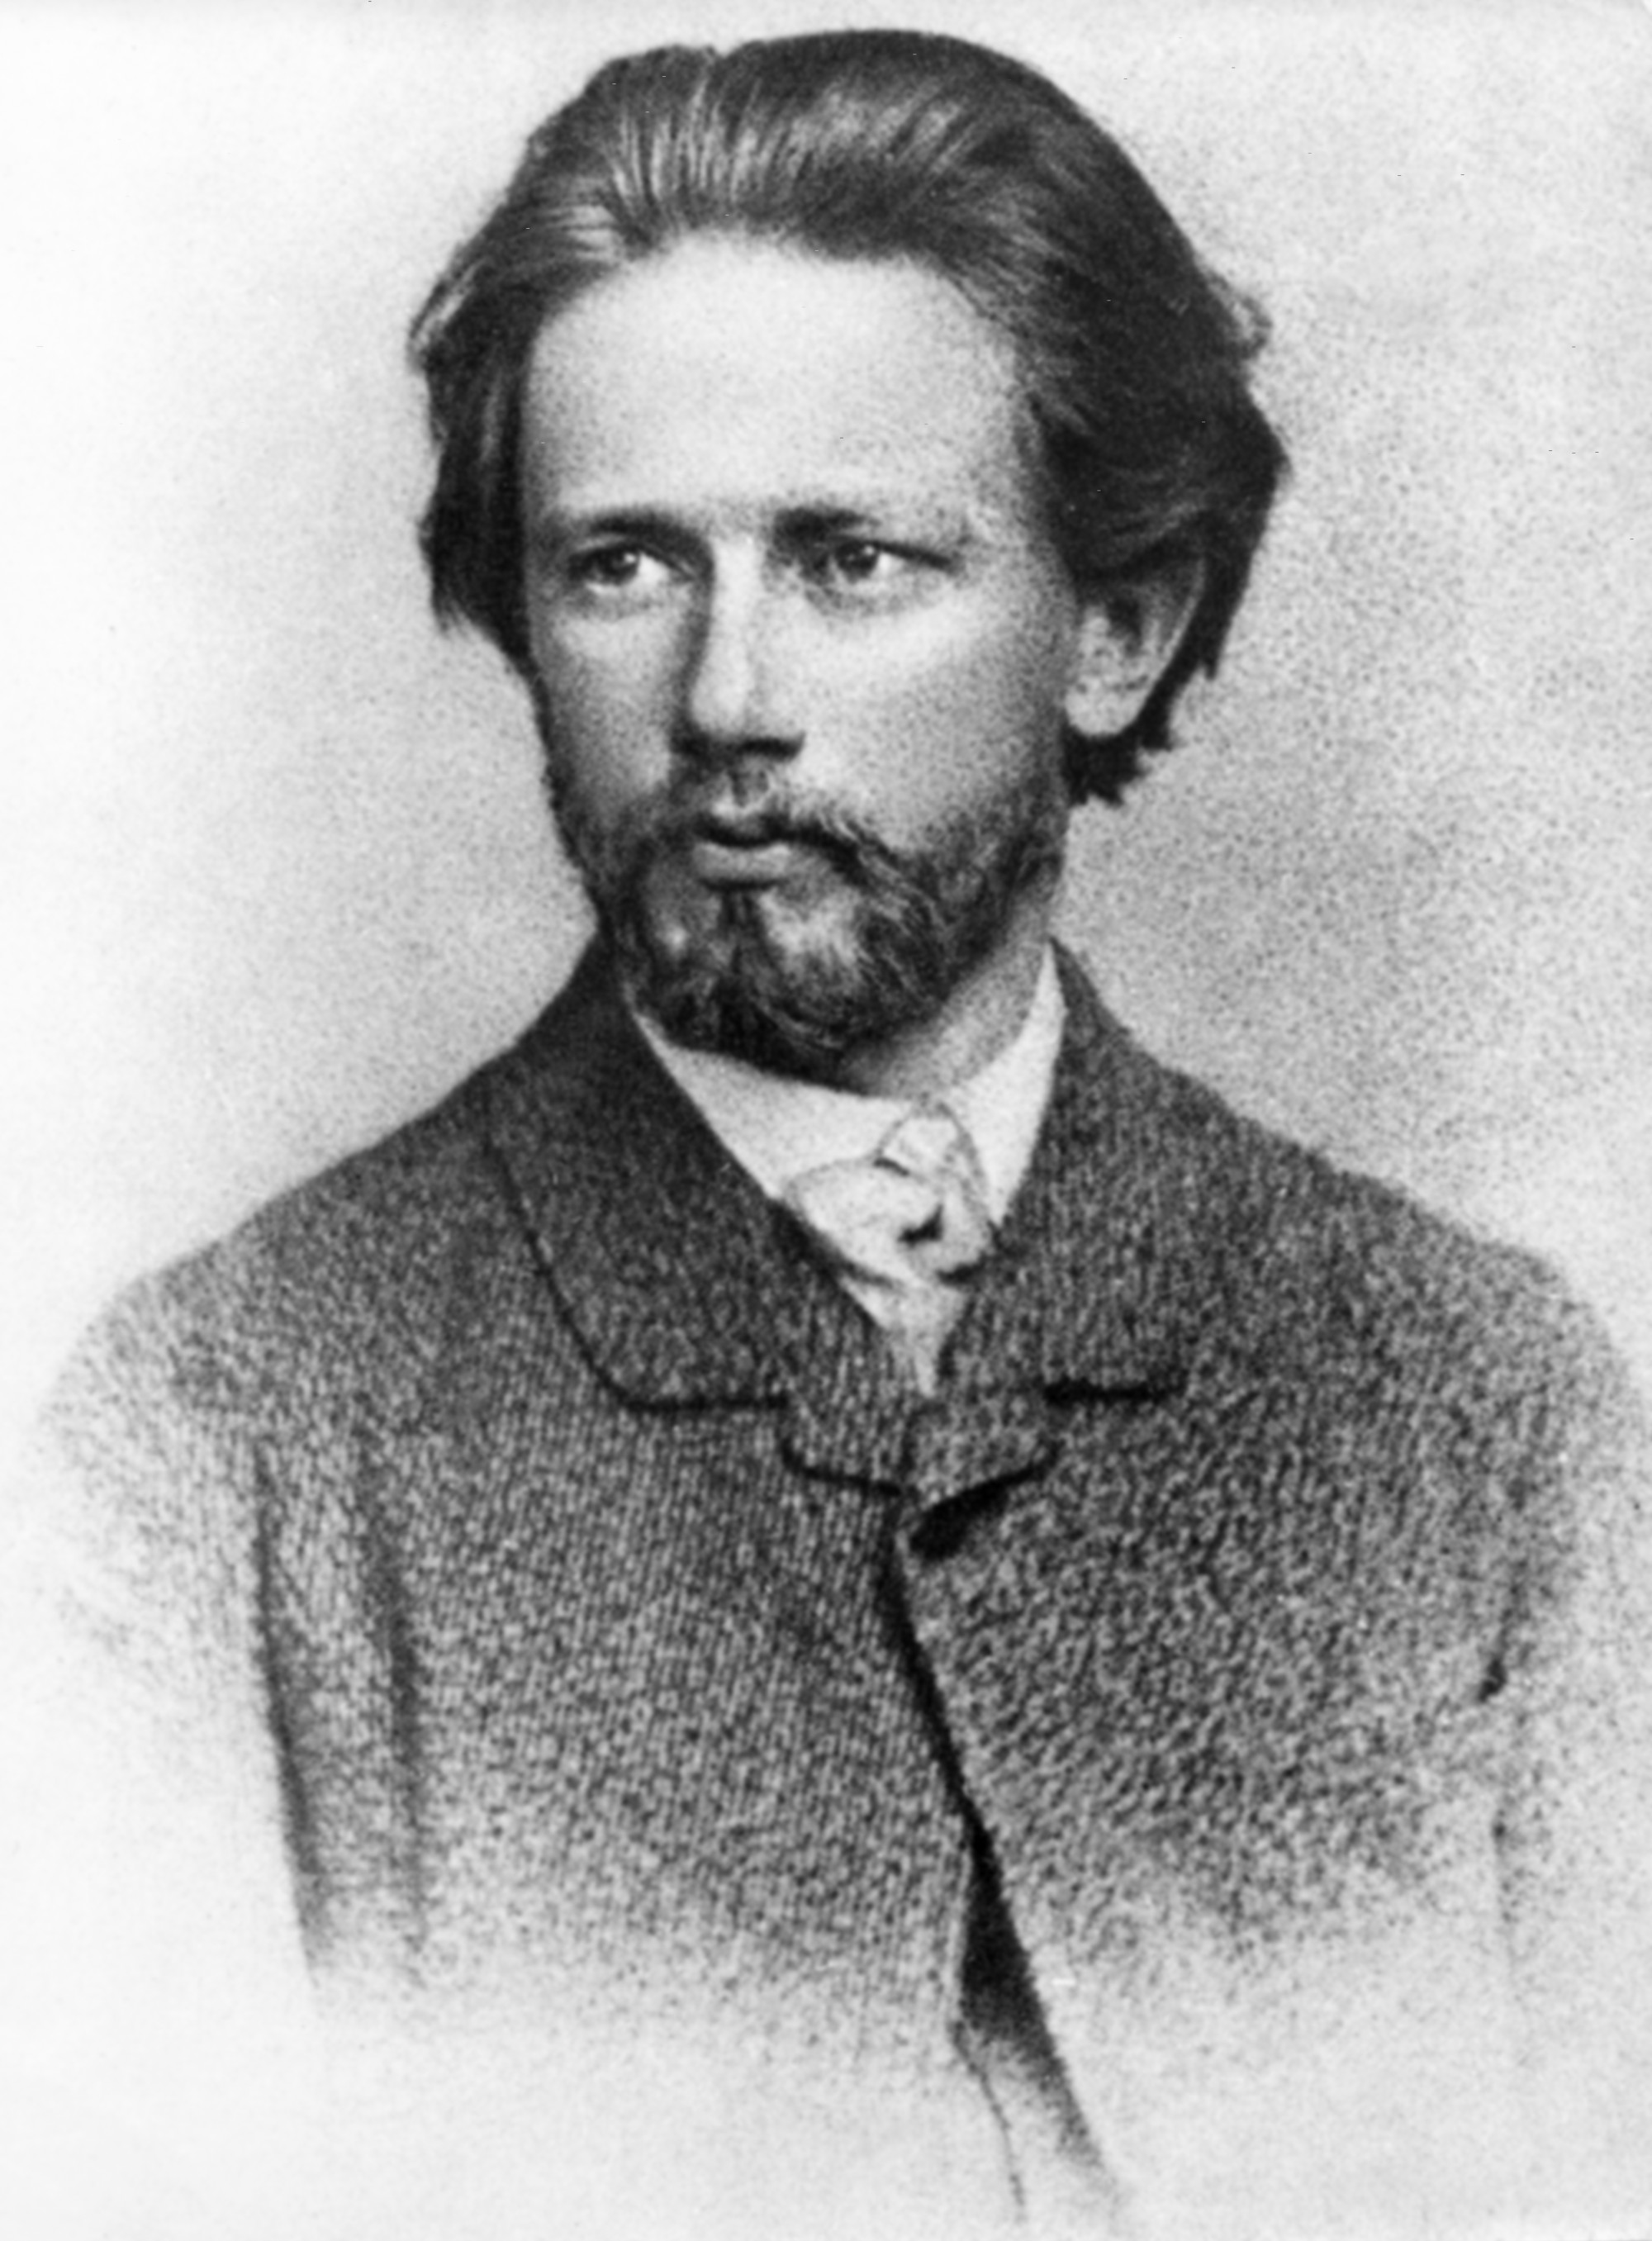 Pyotr Ilyich Tchaikovsky Tchaikowsky - Alfred Wallenstein Symphony VI In B Minor • Opus 74